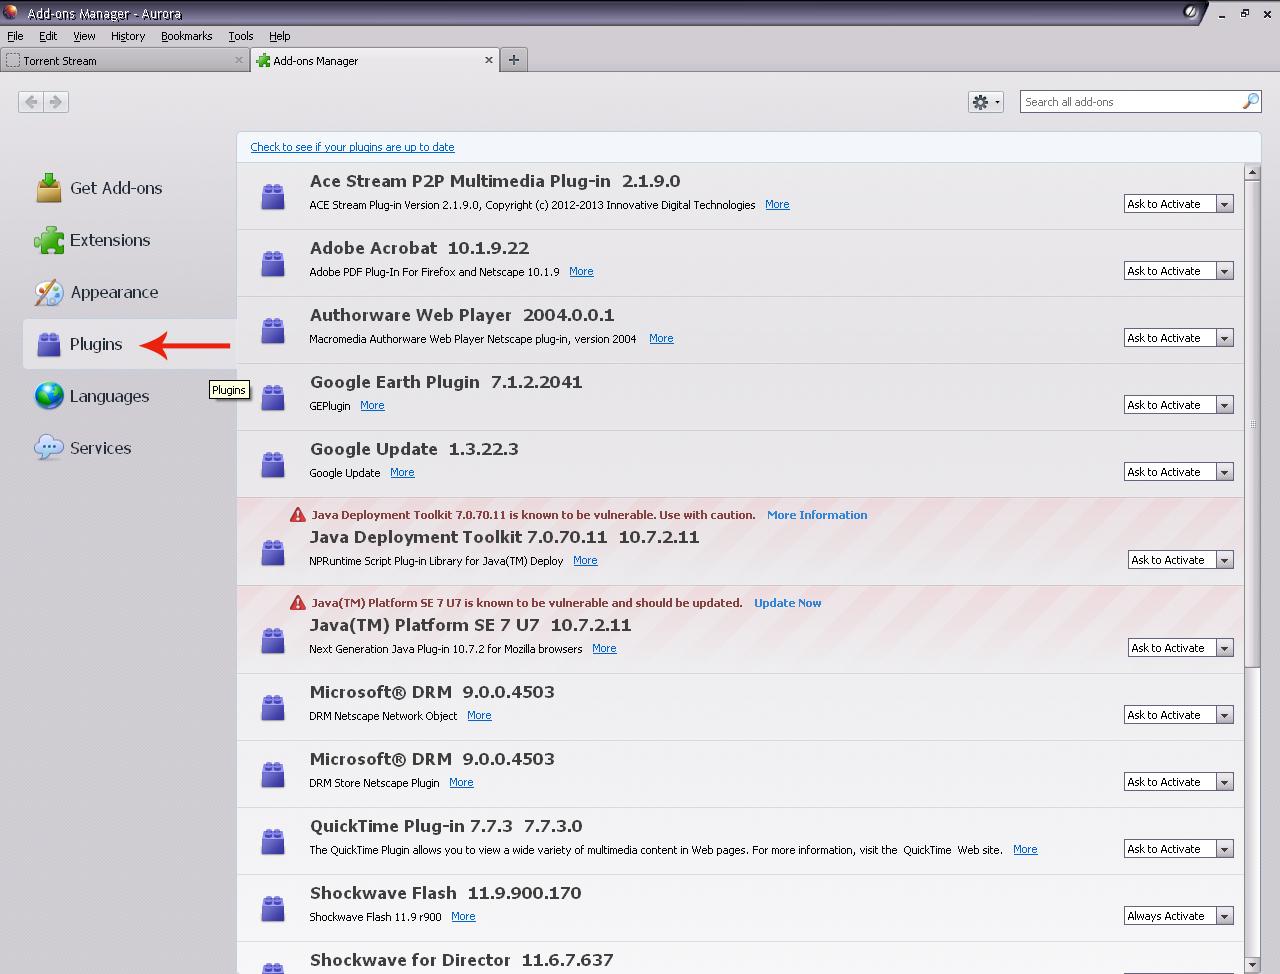 ace stream p2p multimedia plug in download